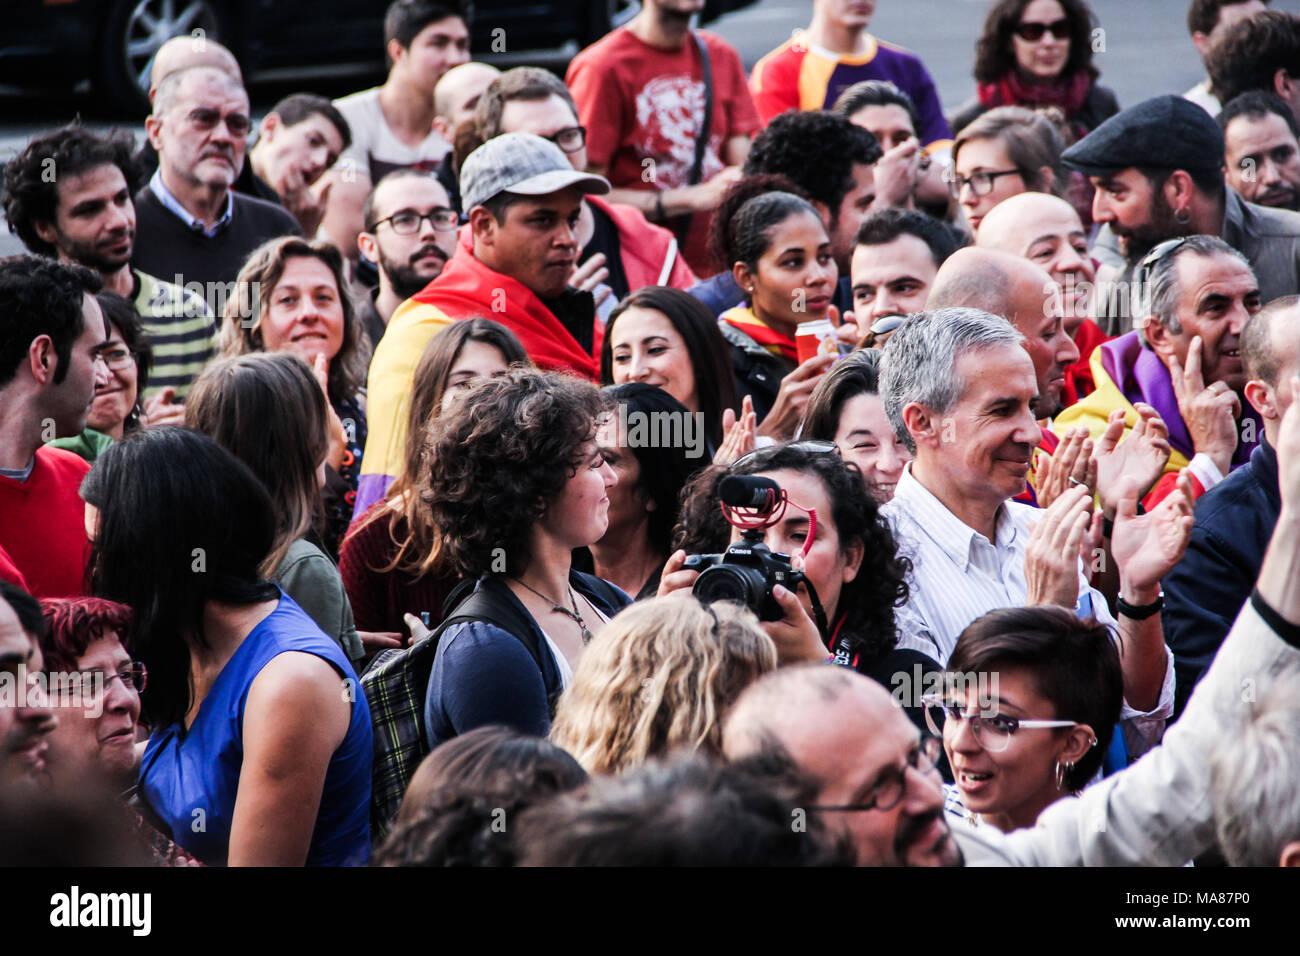 BRUSSELS, BELGIUM, 3 June 2014: Spanish community in Belgium protesting against the Spanish Monarchy - Stock Image